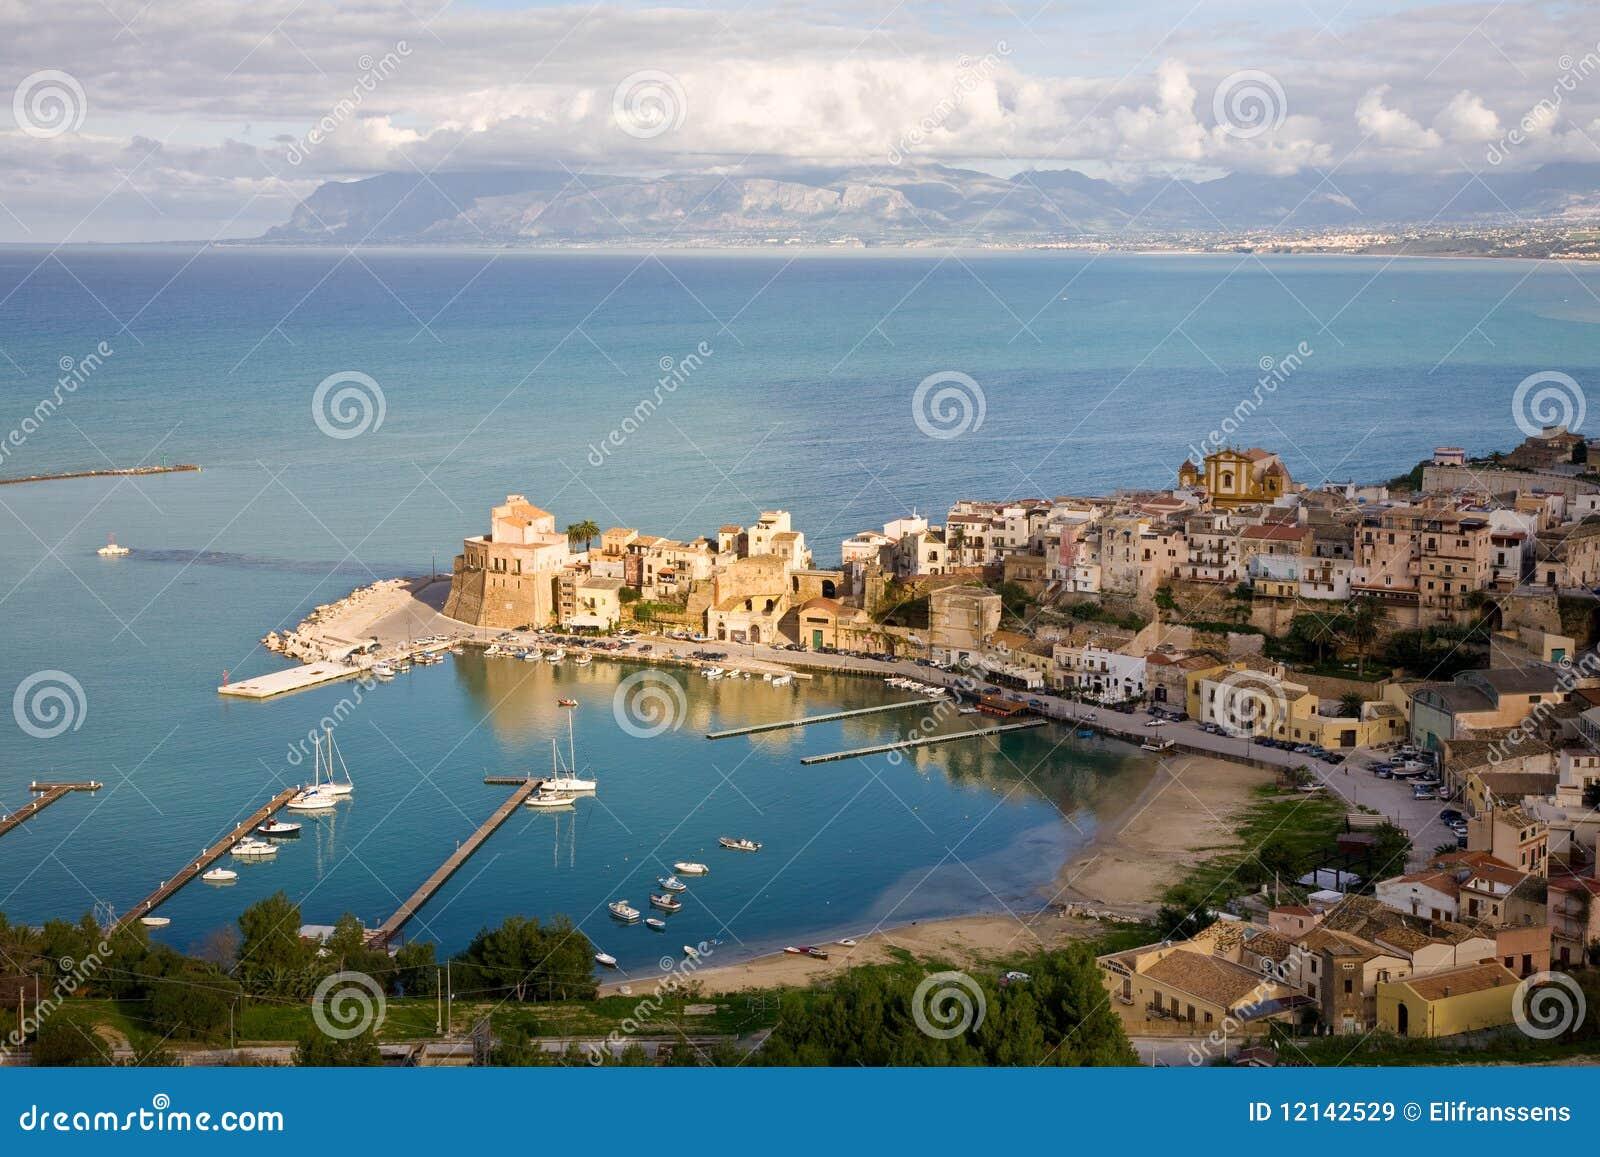 Castellammare del golfo sicily italy stock photo image 48782909 - Castellammare Del Golfo Sicily Italy Royalty Free Stock Images